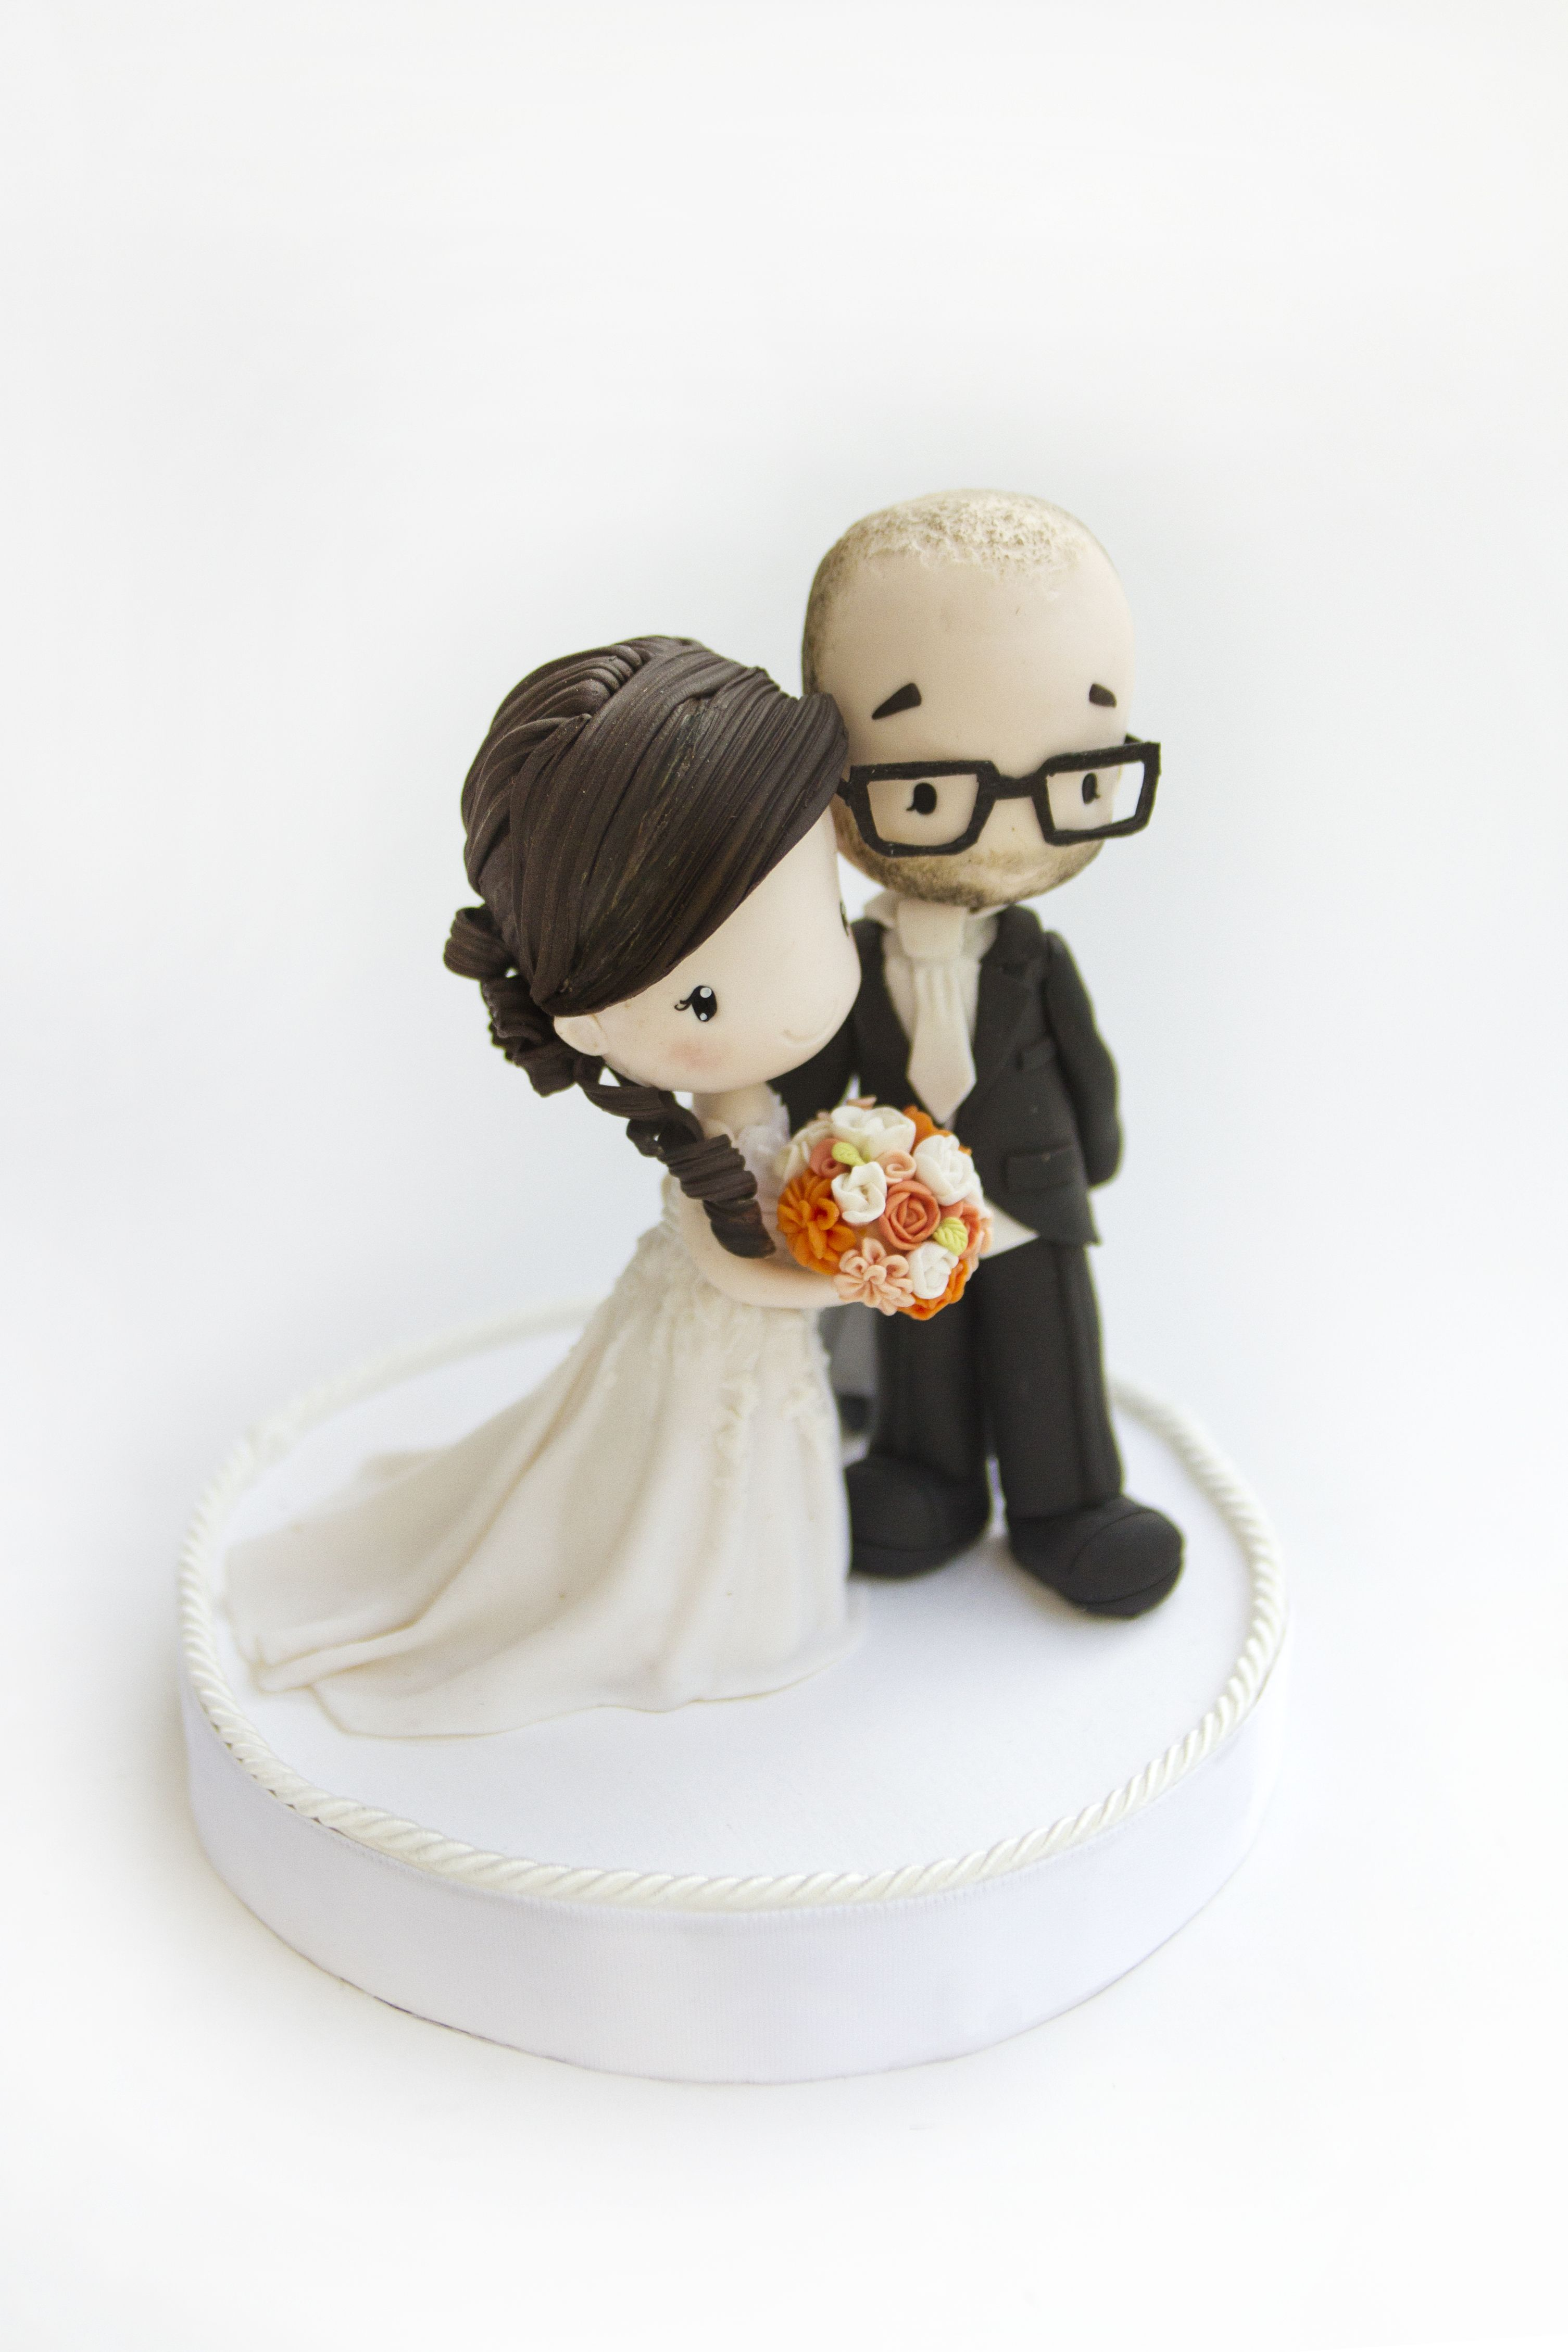 Custom #Wedding #caketoppers - Polymer clay #Handmade dolls ...